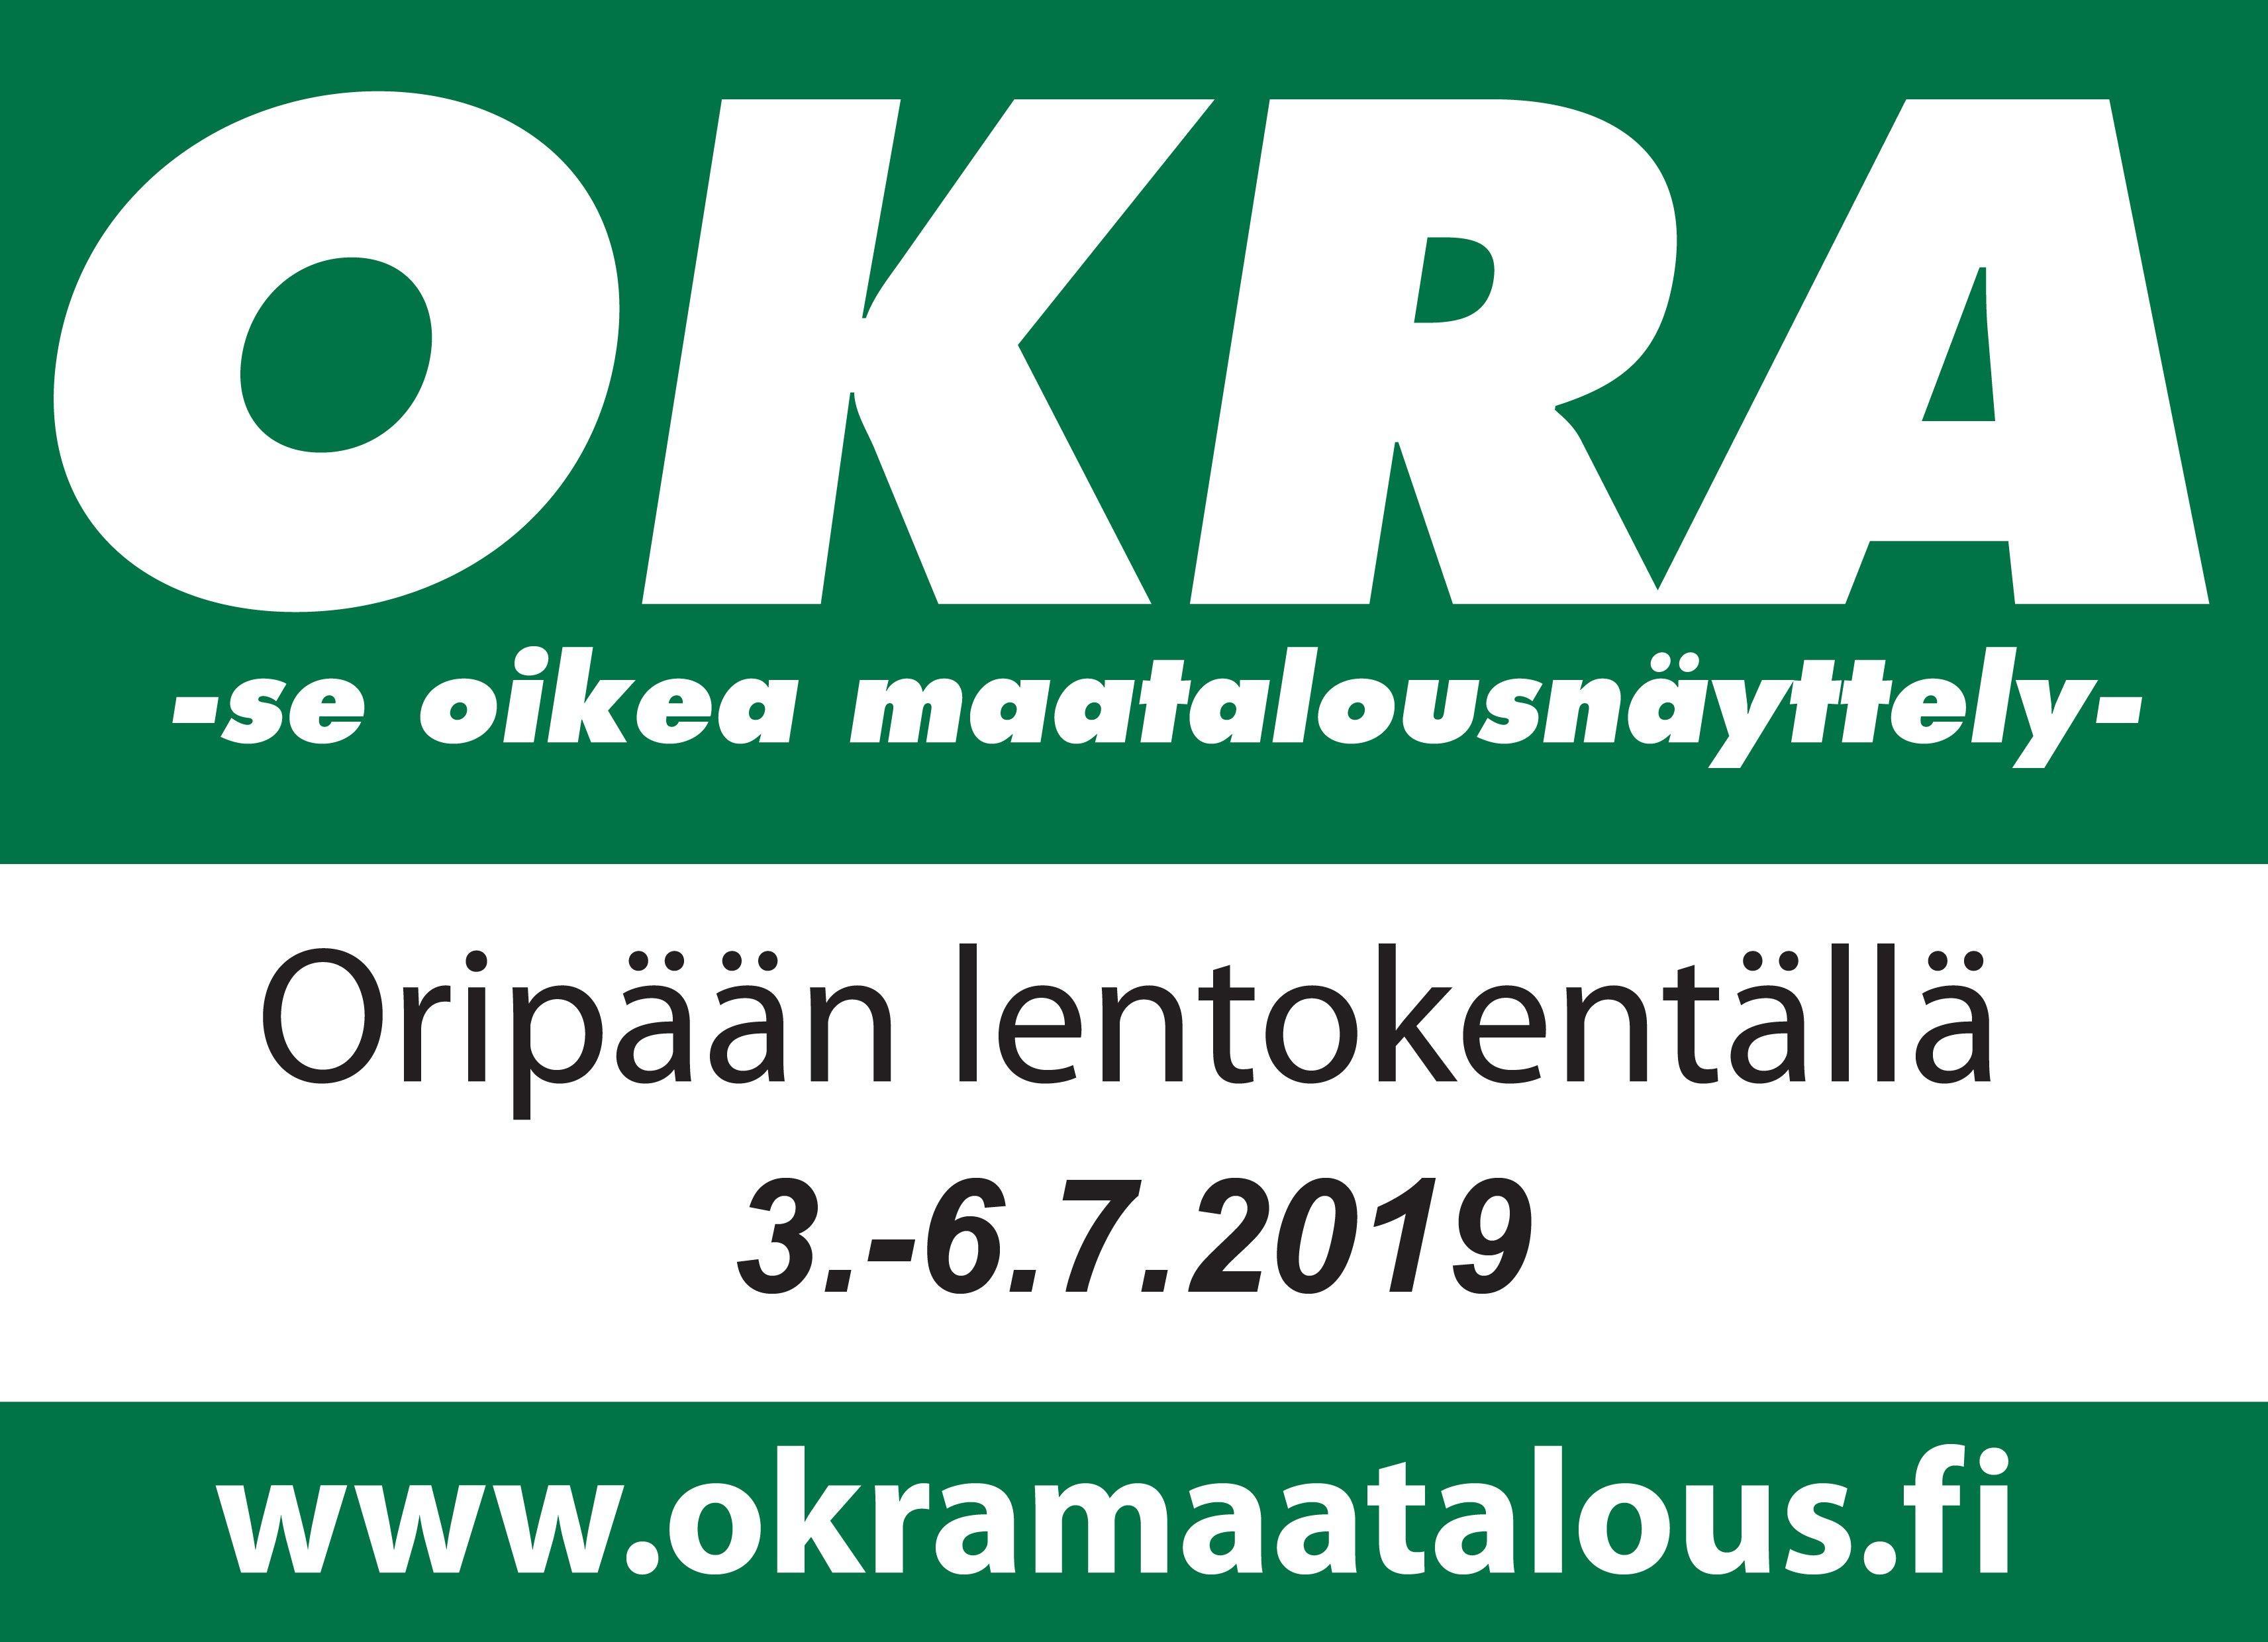 OKRA2019